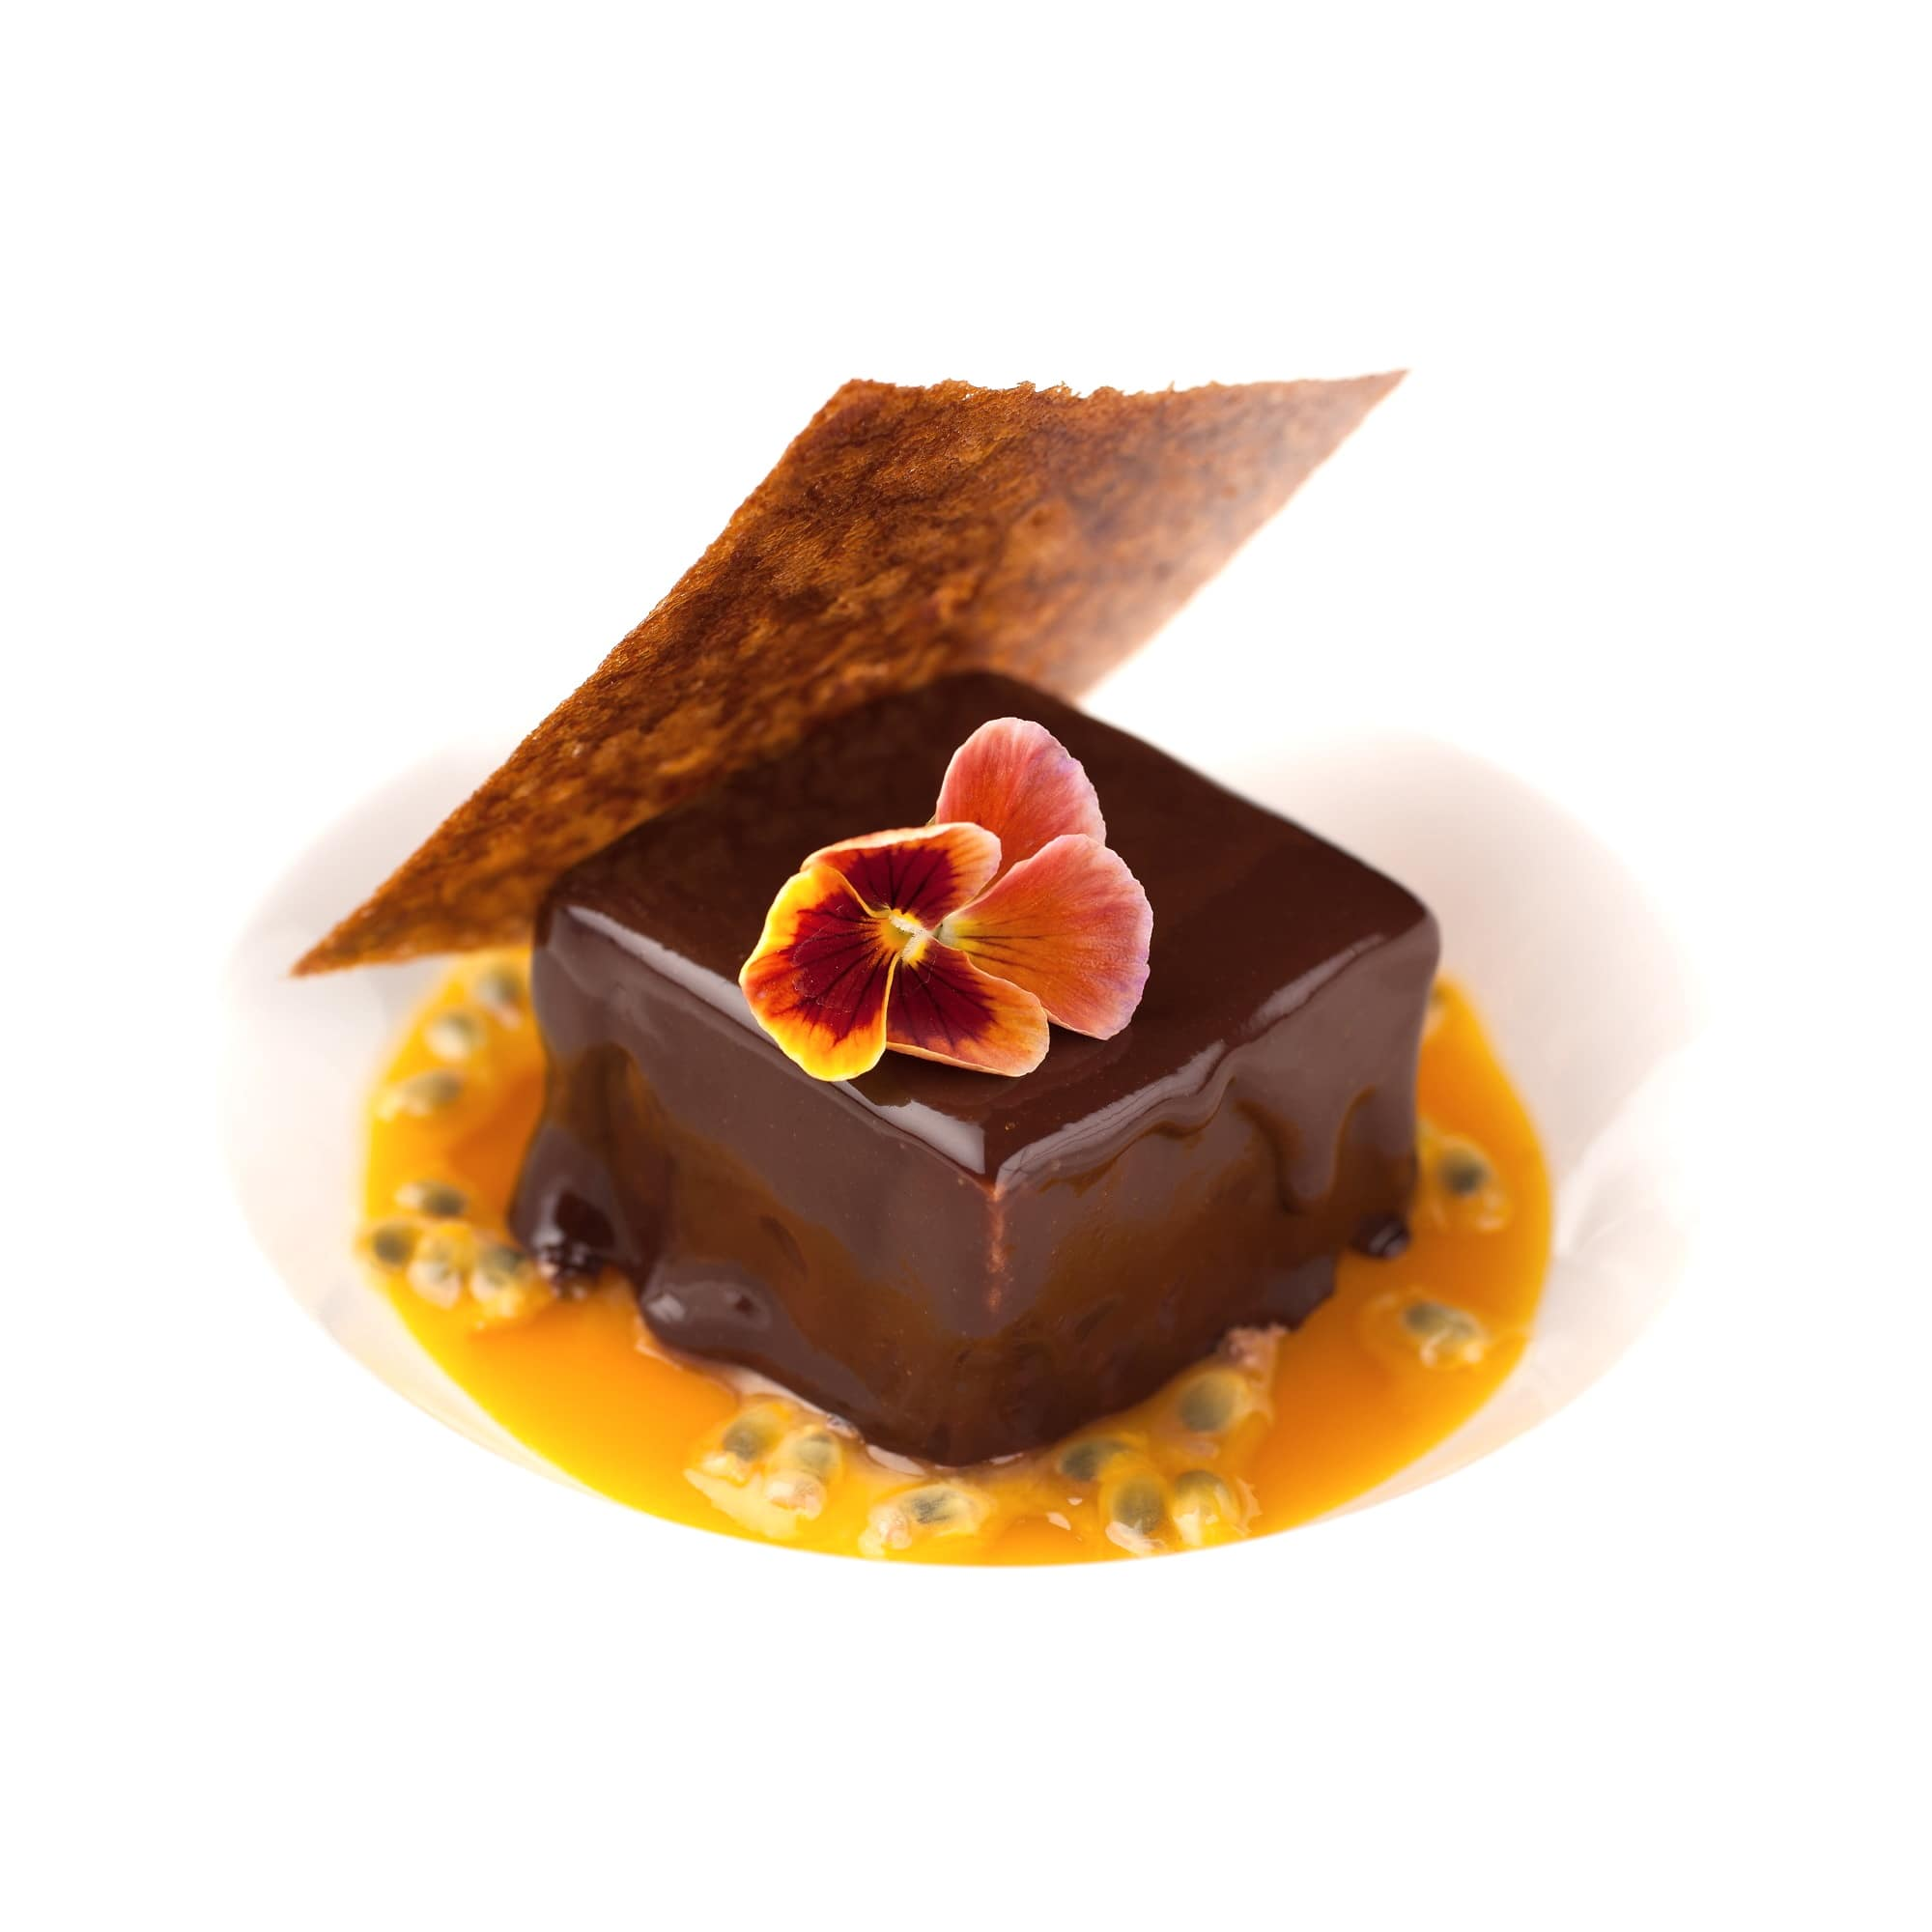 Parfait au chocolat et passion, tuile craquante.